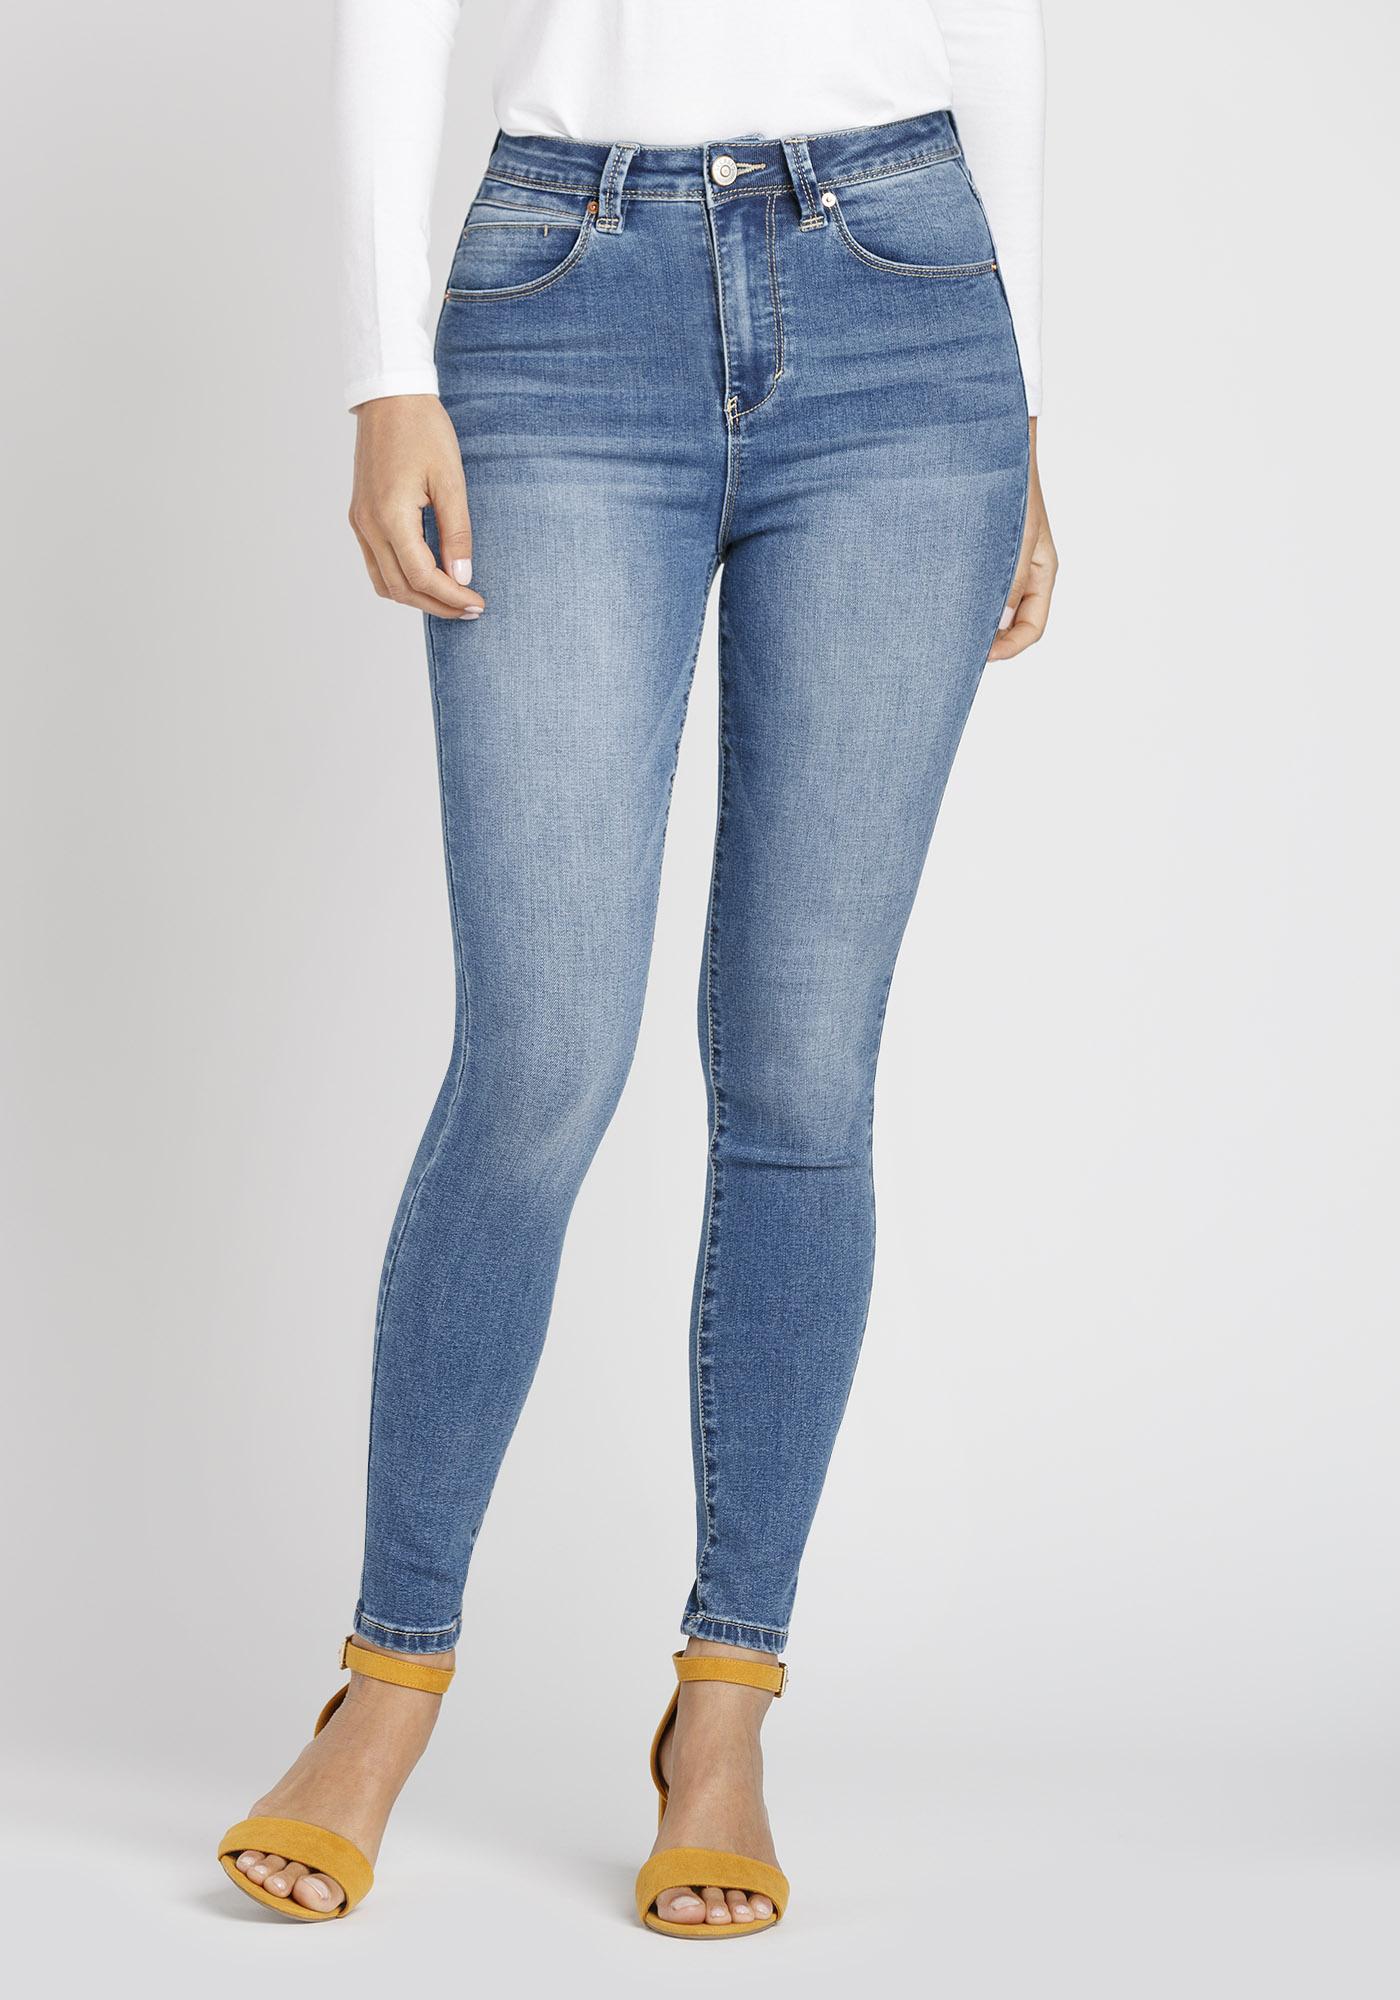 2b357cdcd15 Women s Super High Rise Skinny Jeans